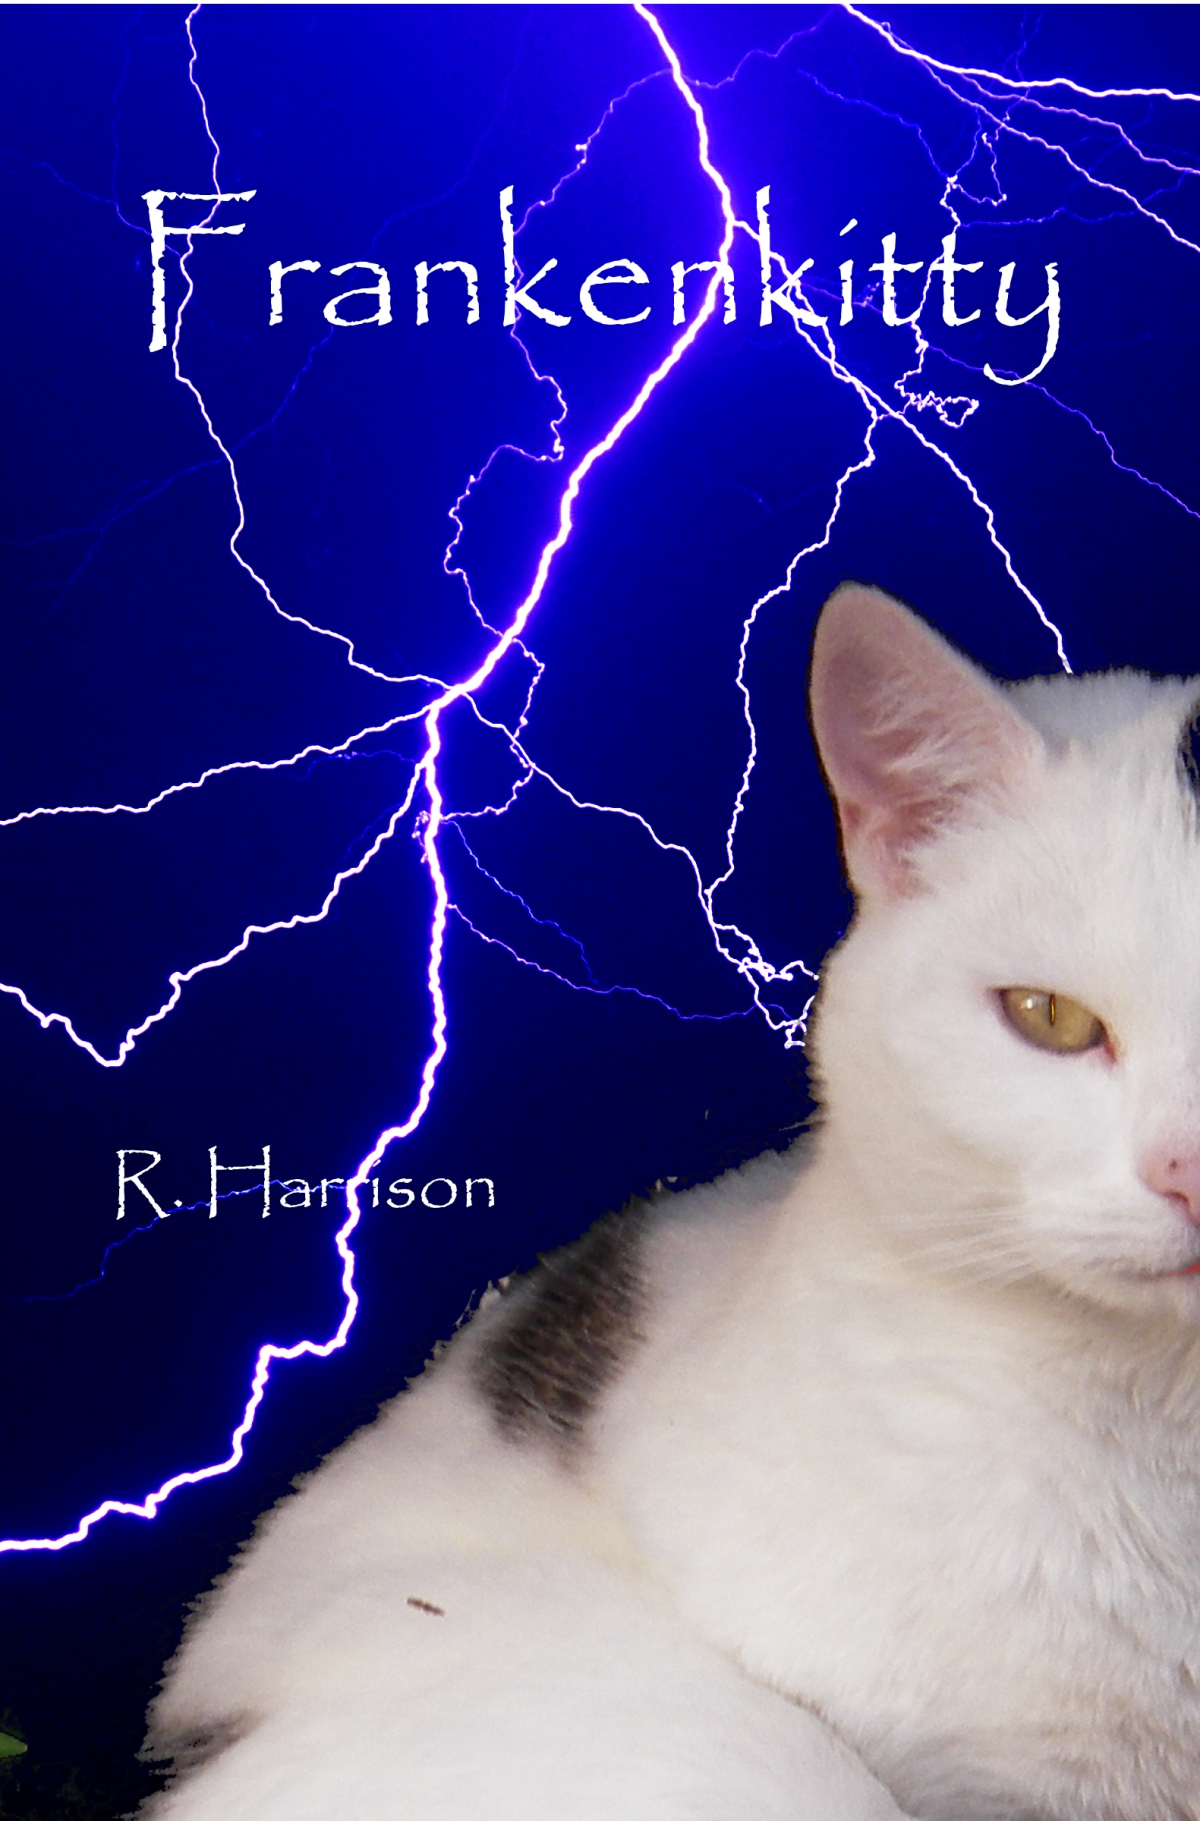 Frankenkitty #indiebooksbeseen #newbook